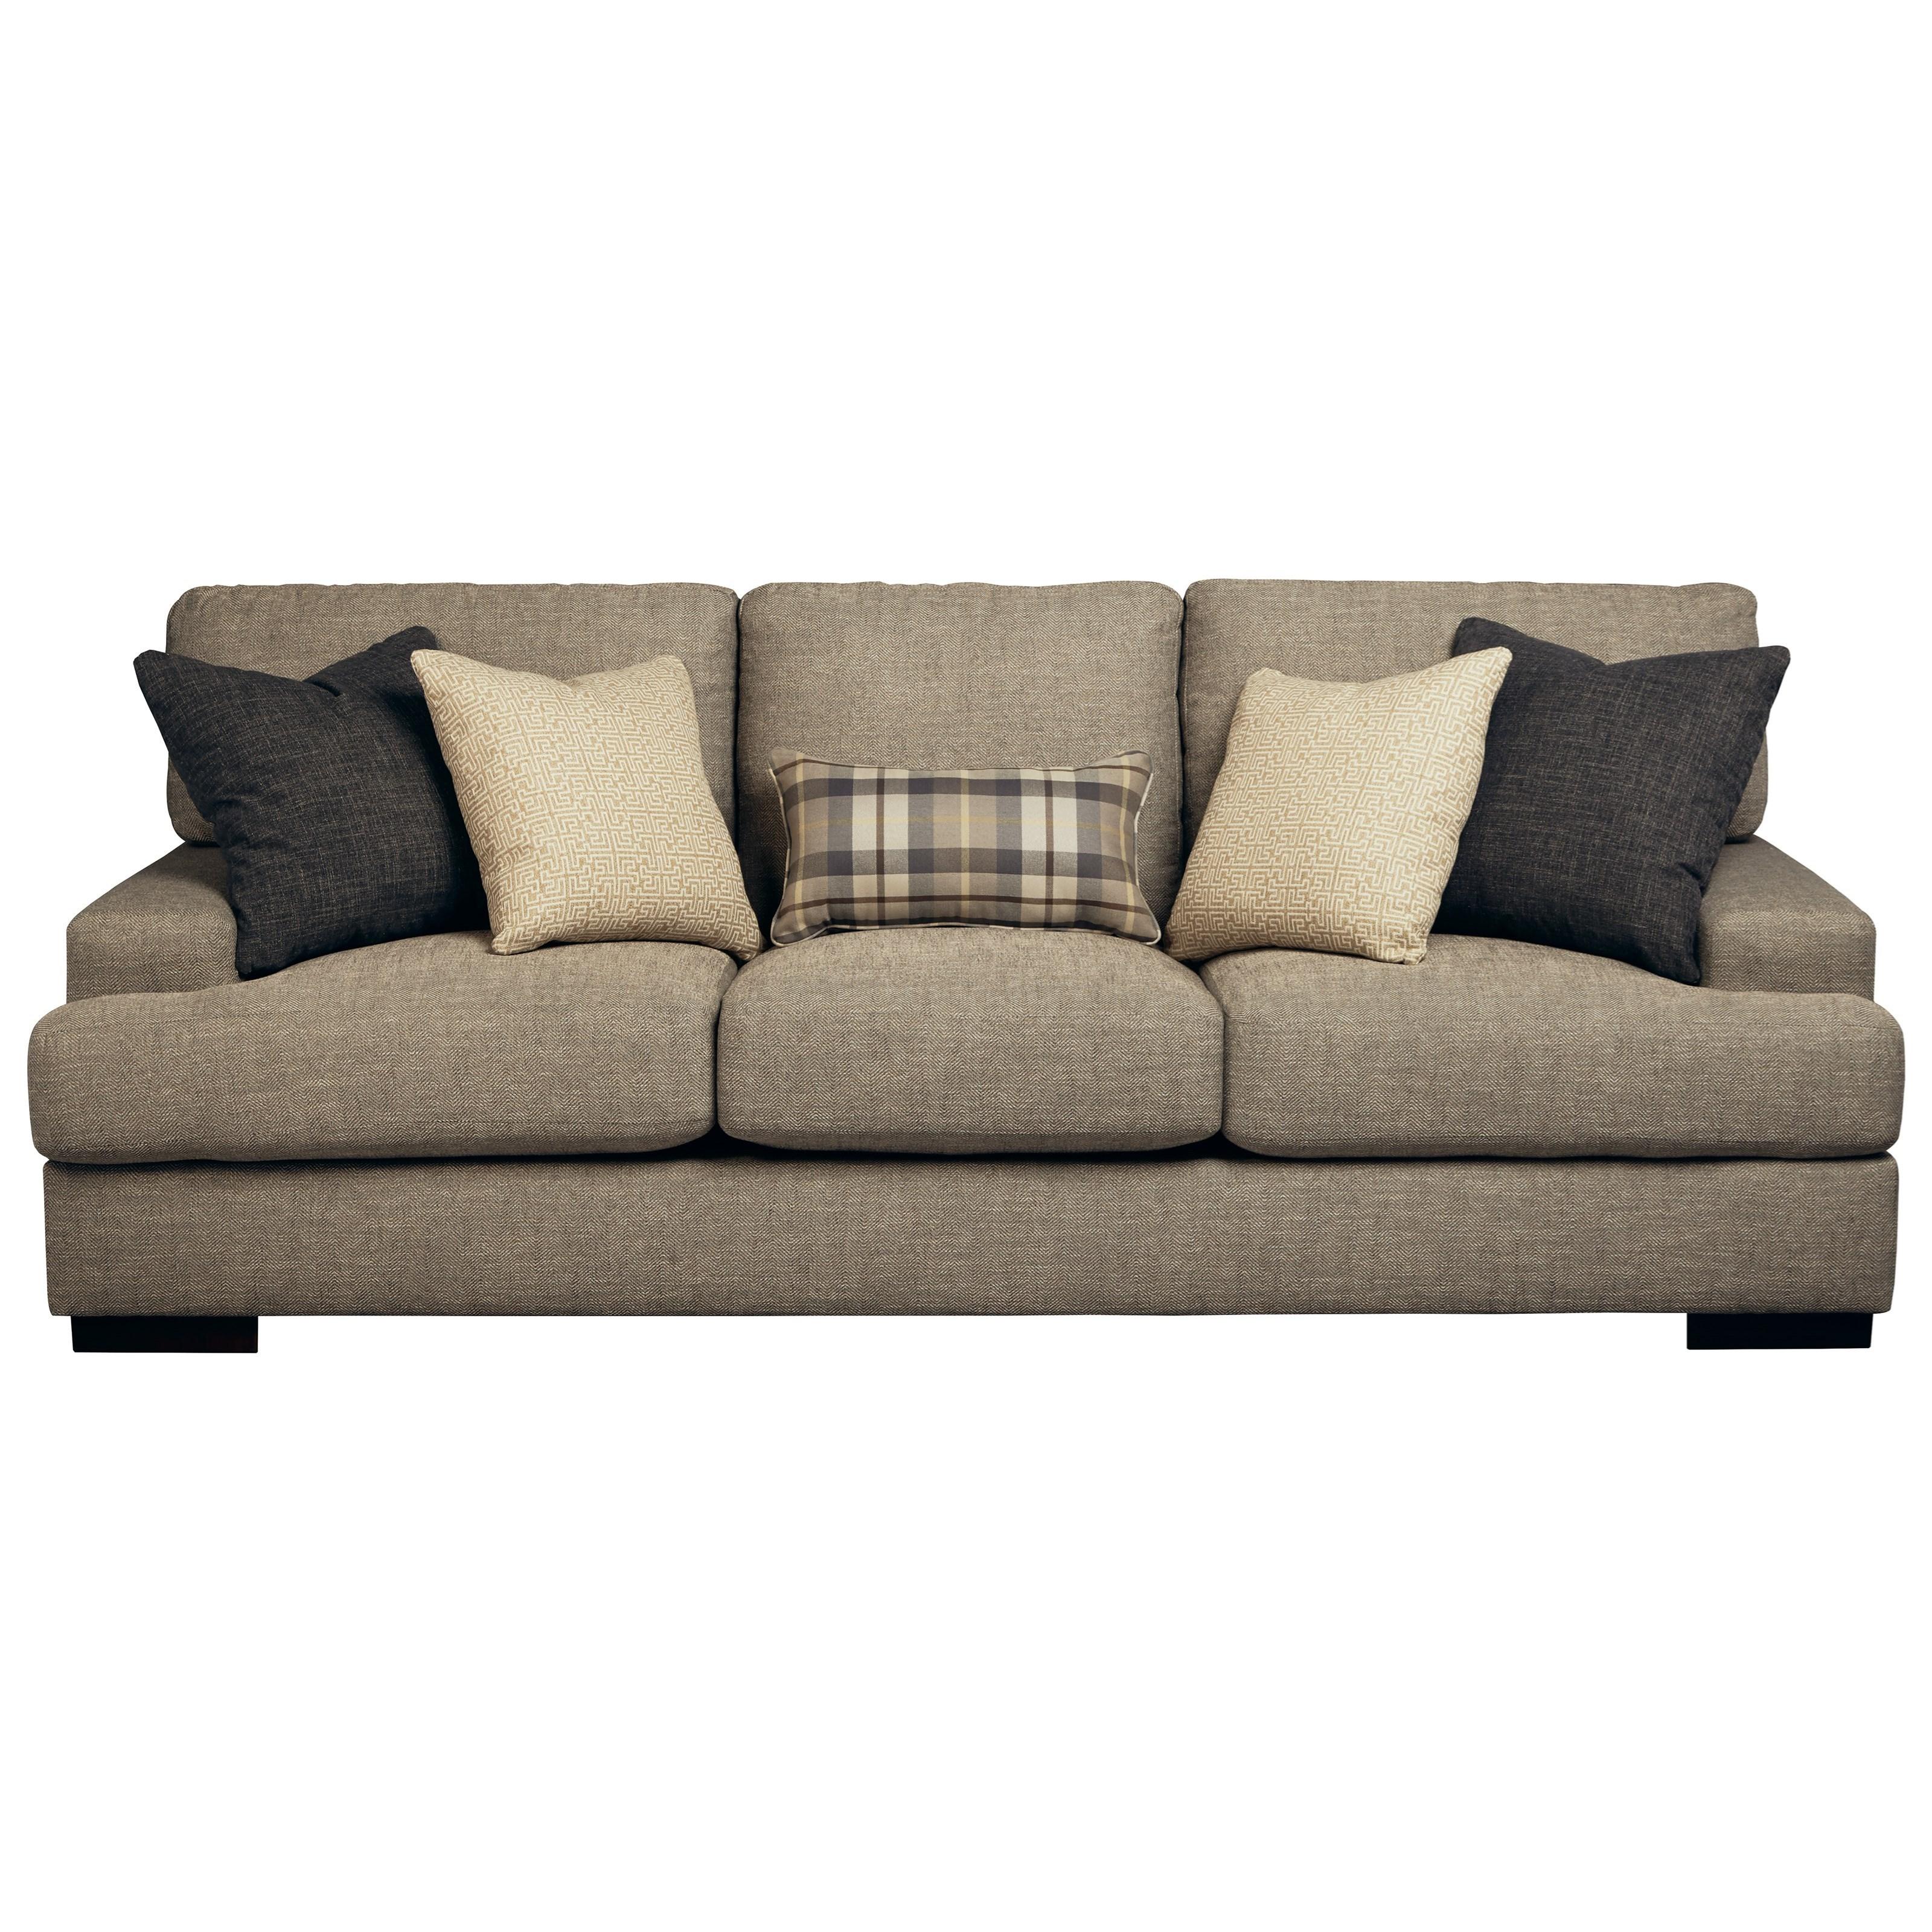 Millennium Austwell 5590138 Relaxed Vintage Sofa | Household Furniture |  Sofas